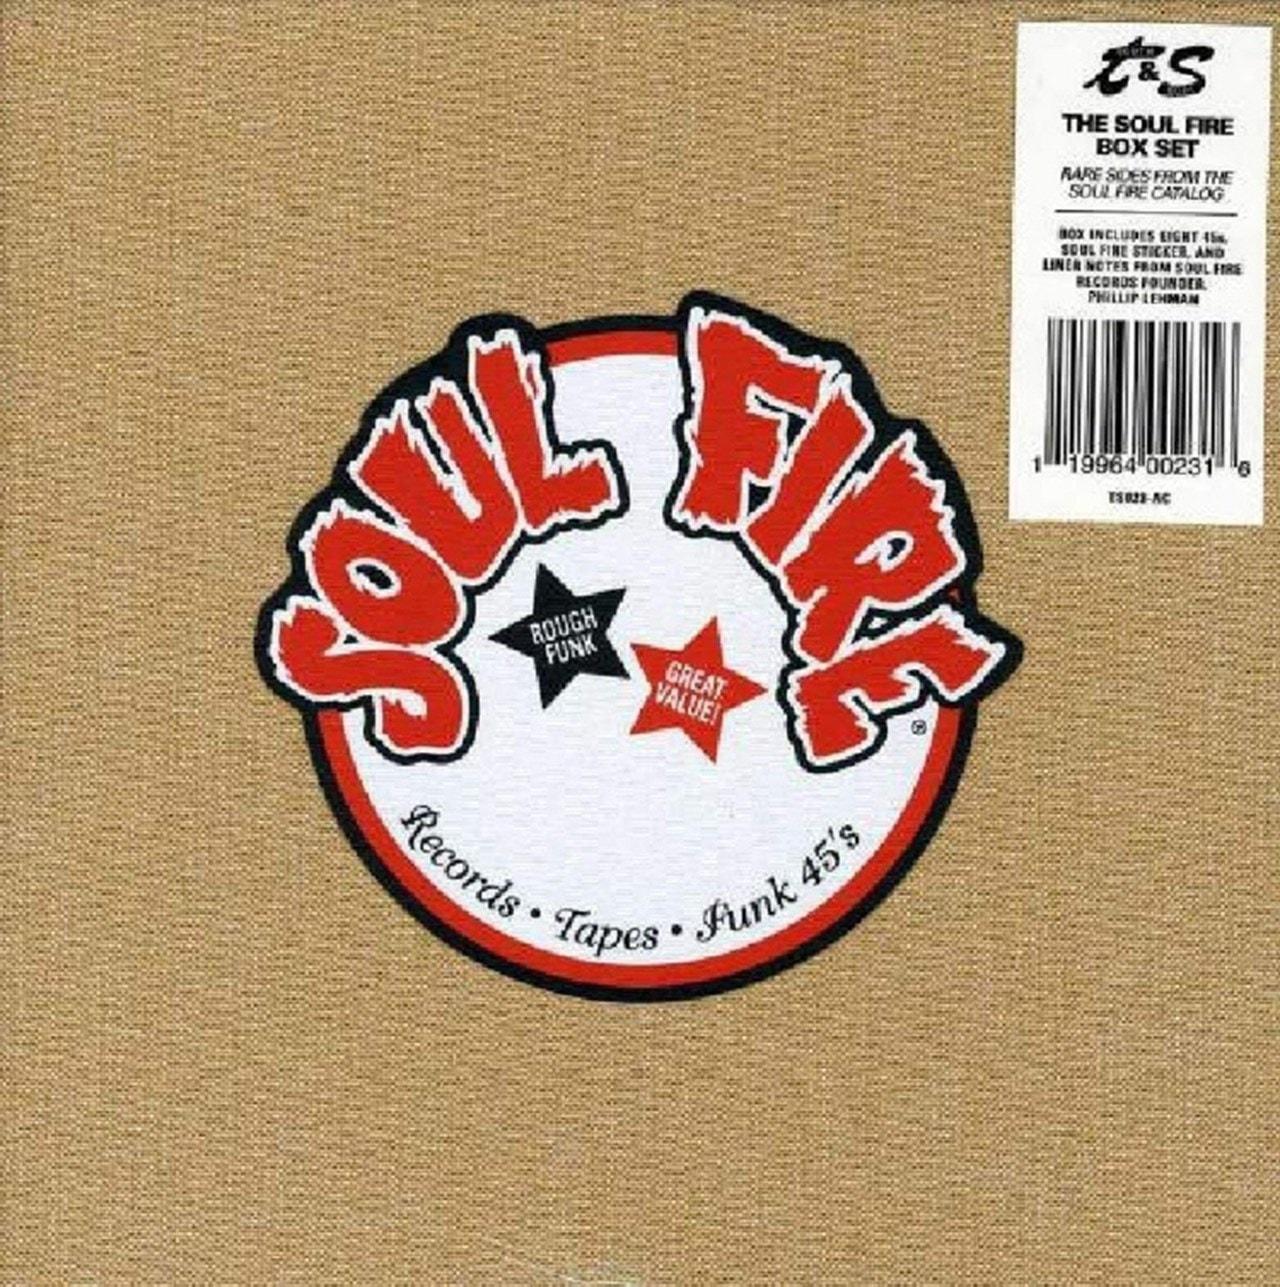 The Soul Fire Box Set - 1